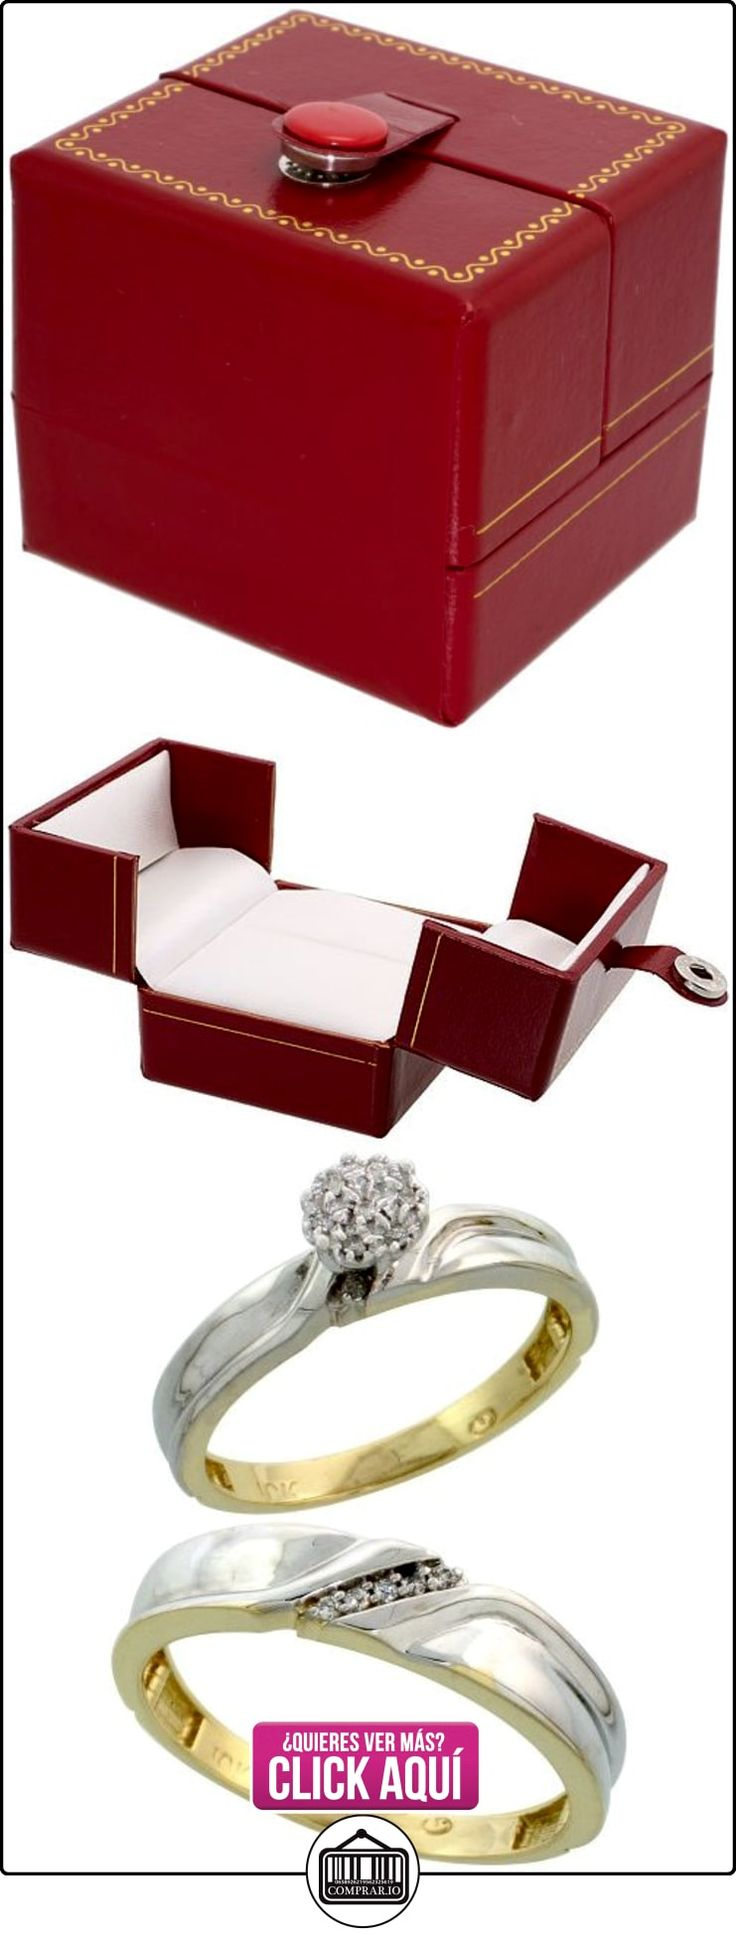 Revoni - Anillo de compromiso de oro amarillo  ✿ Joyas para hombres especiales - lujo ✿ ▬► Ver oferta: https://comprar.io/goto/B005M3CO86